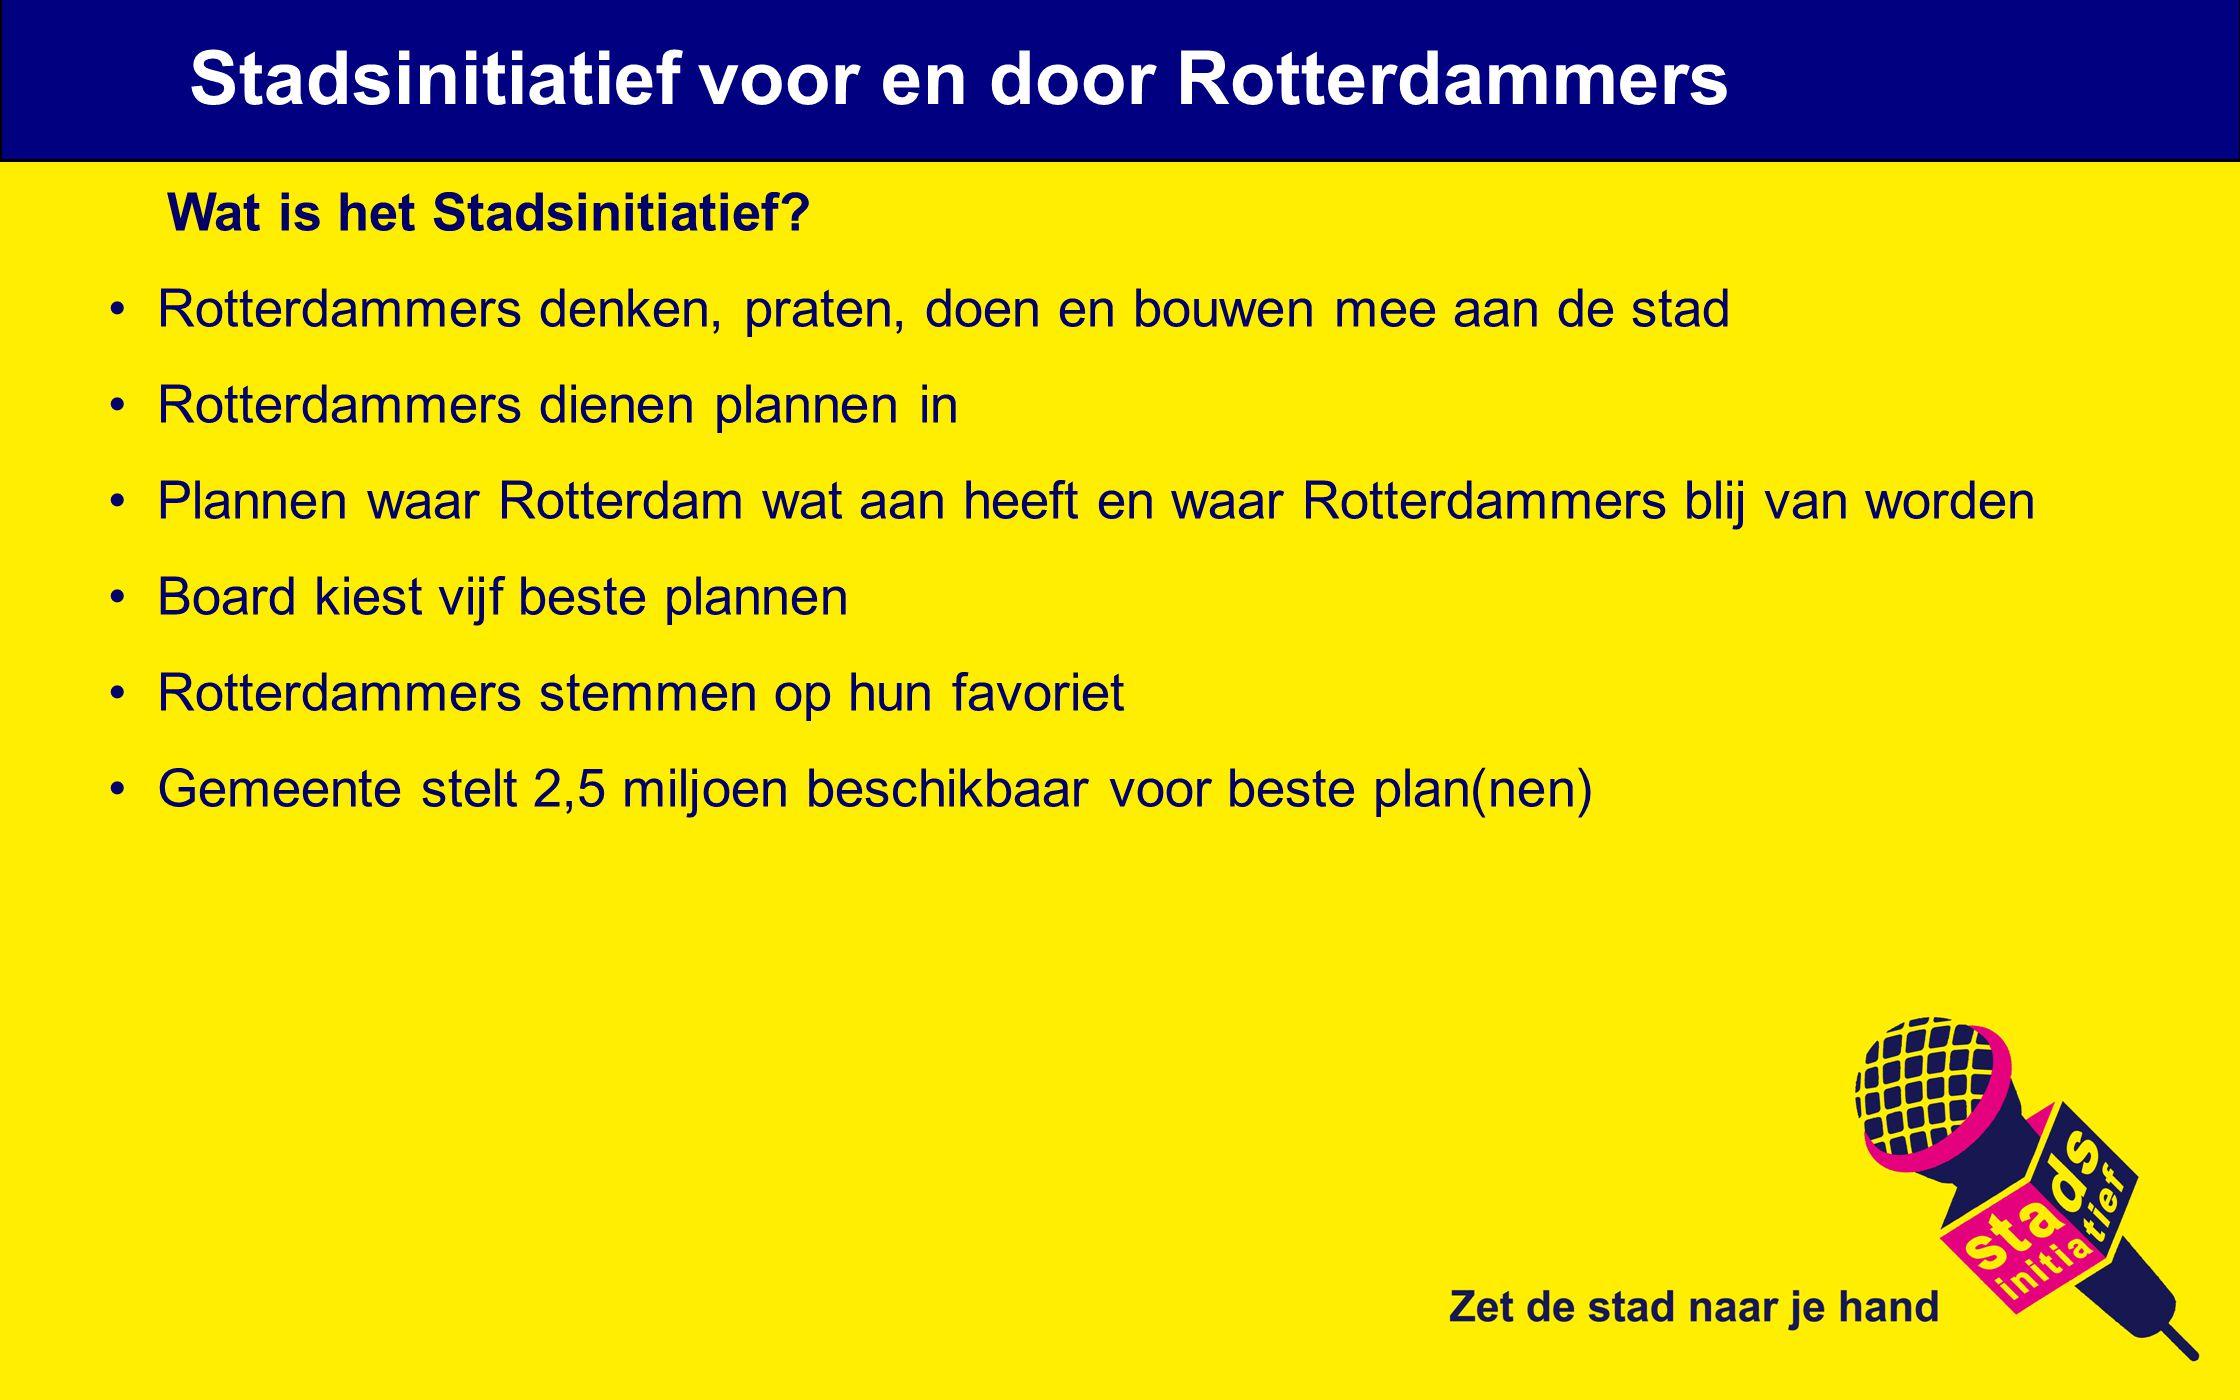 Rotterdammers dienen plannen in tot 14 februari 2013 Rotterdammers stemmen vanaf 23 mei op hun favoriet Rotterdammers doen mee